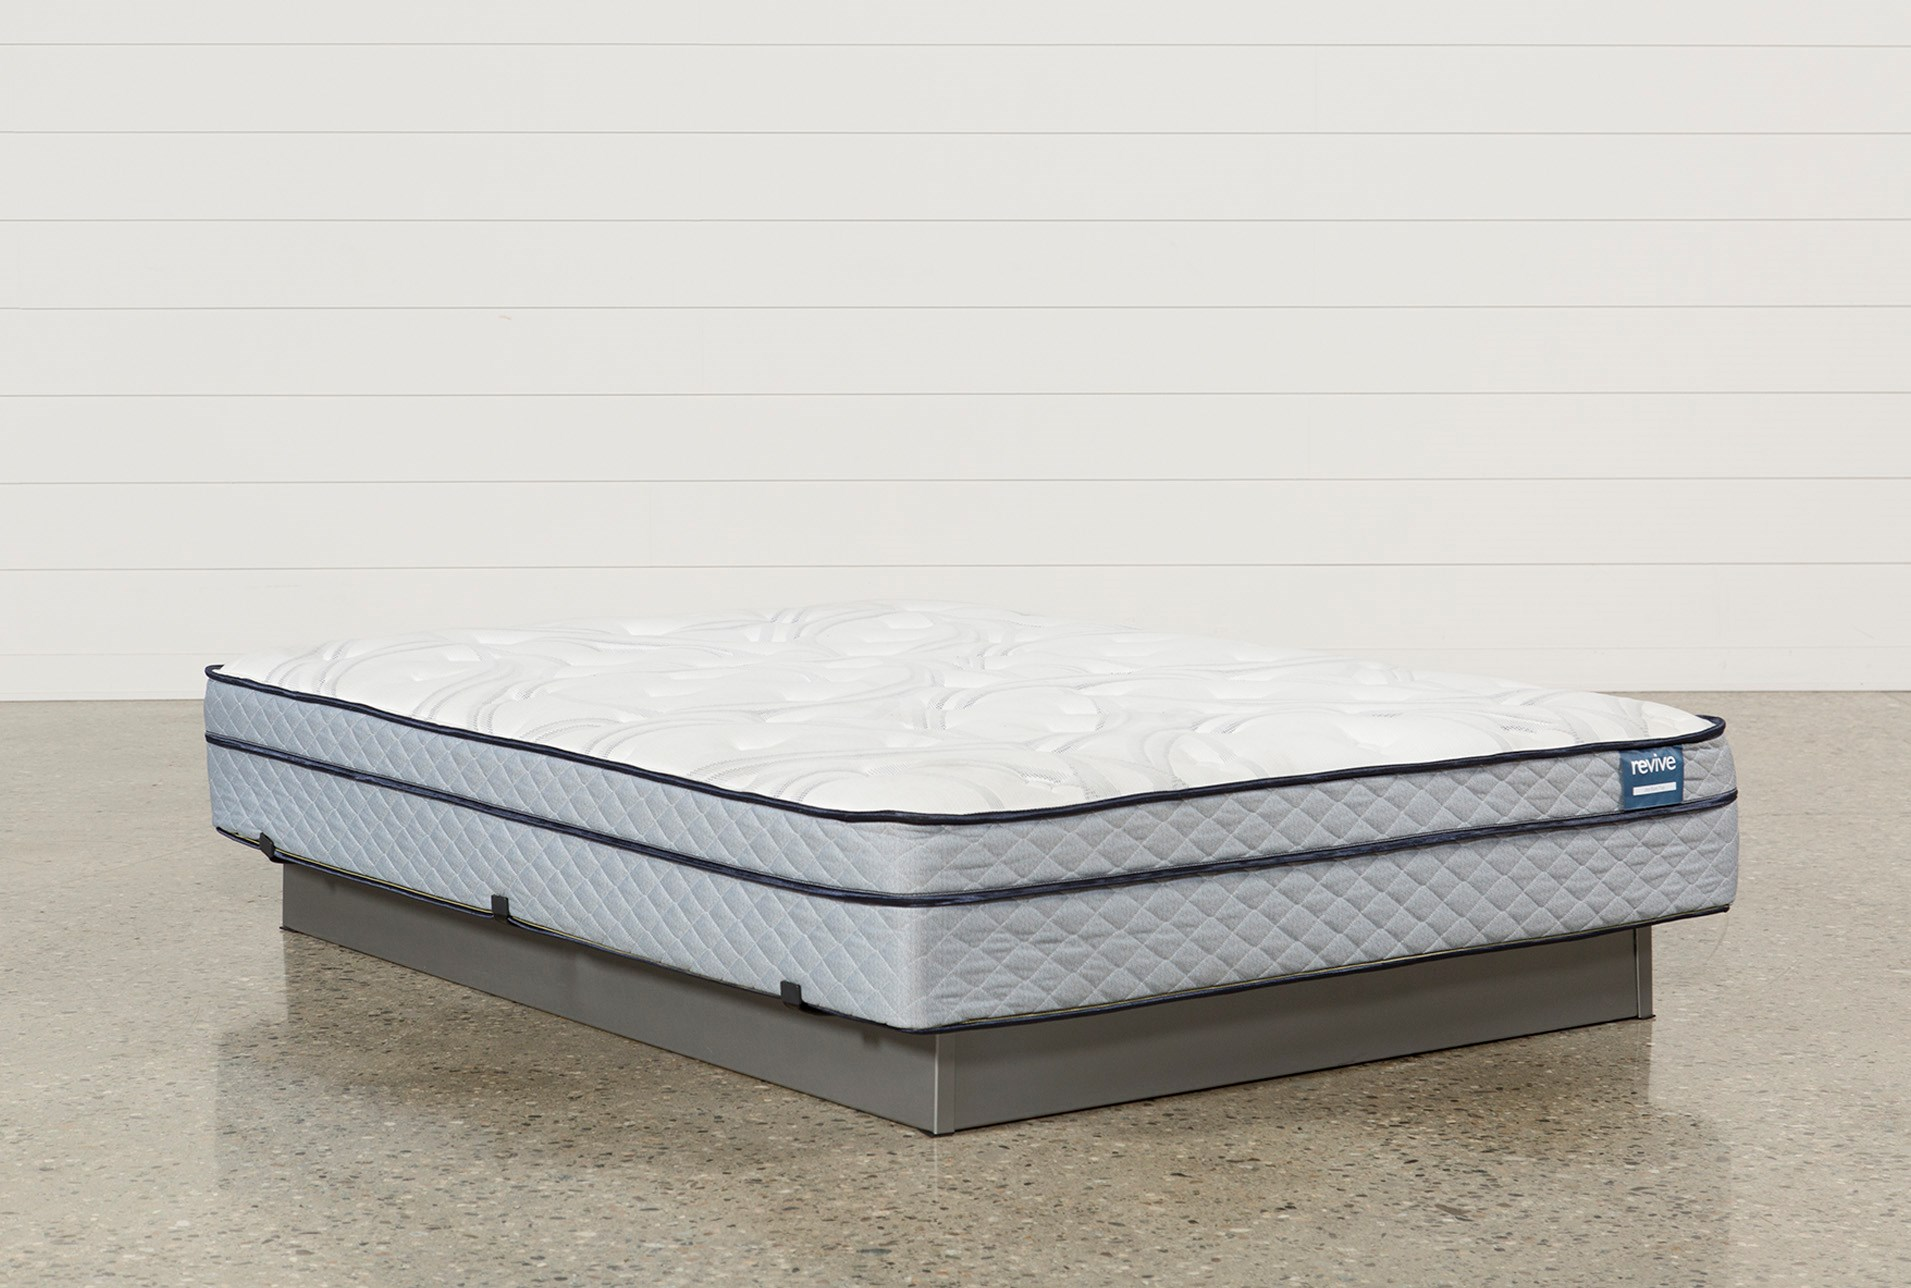 queen mattress pillow top memory foam joy euro pillow top queen mattress qty 1 has been successfully added to your cart living spaces